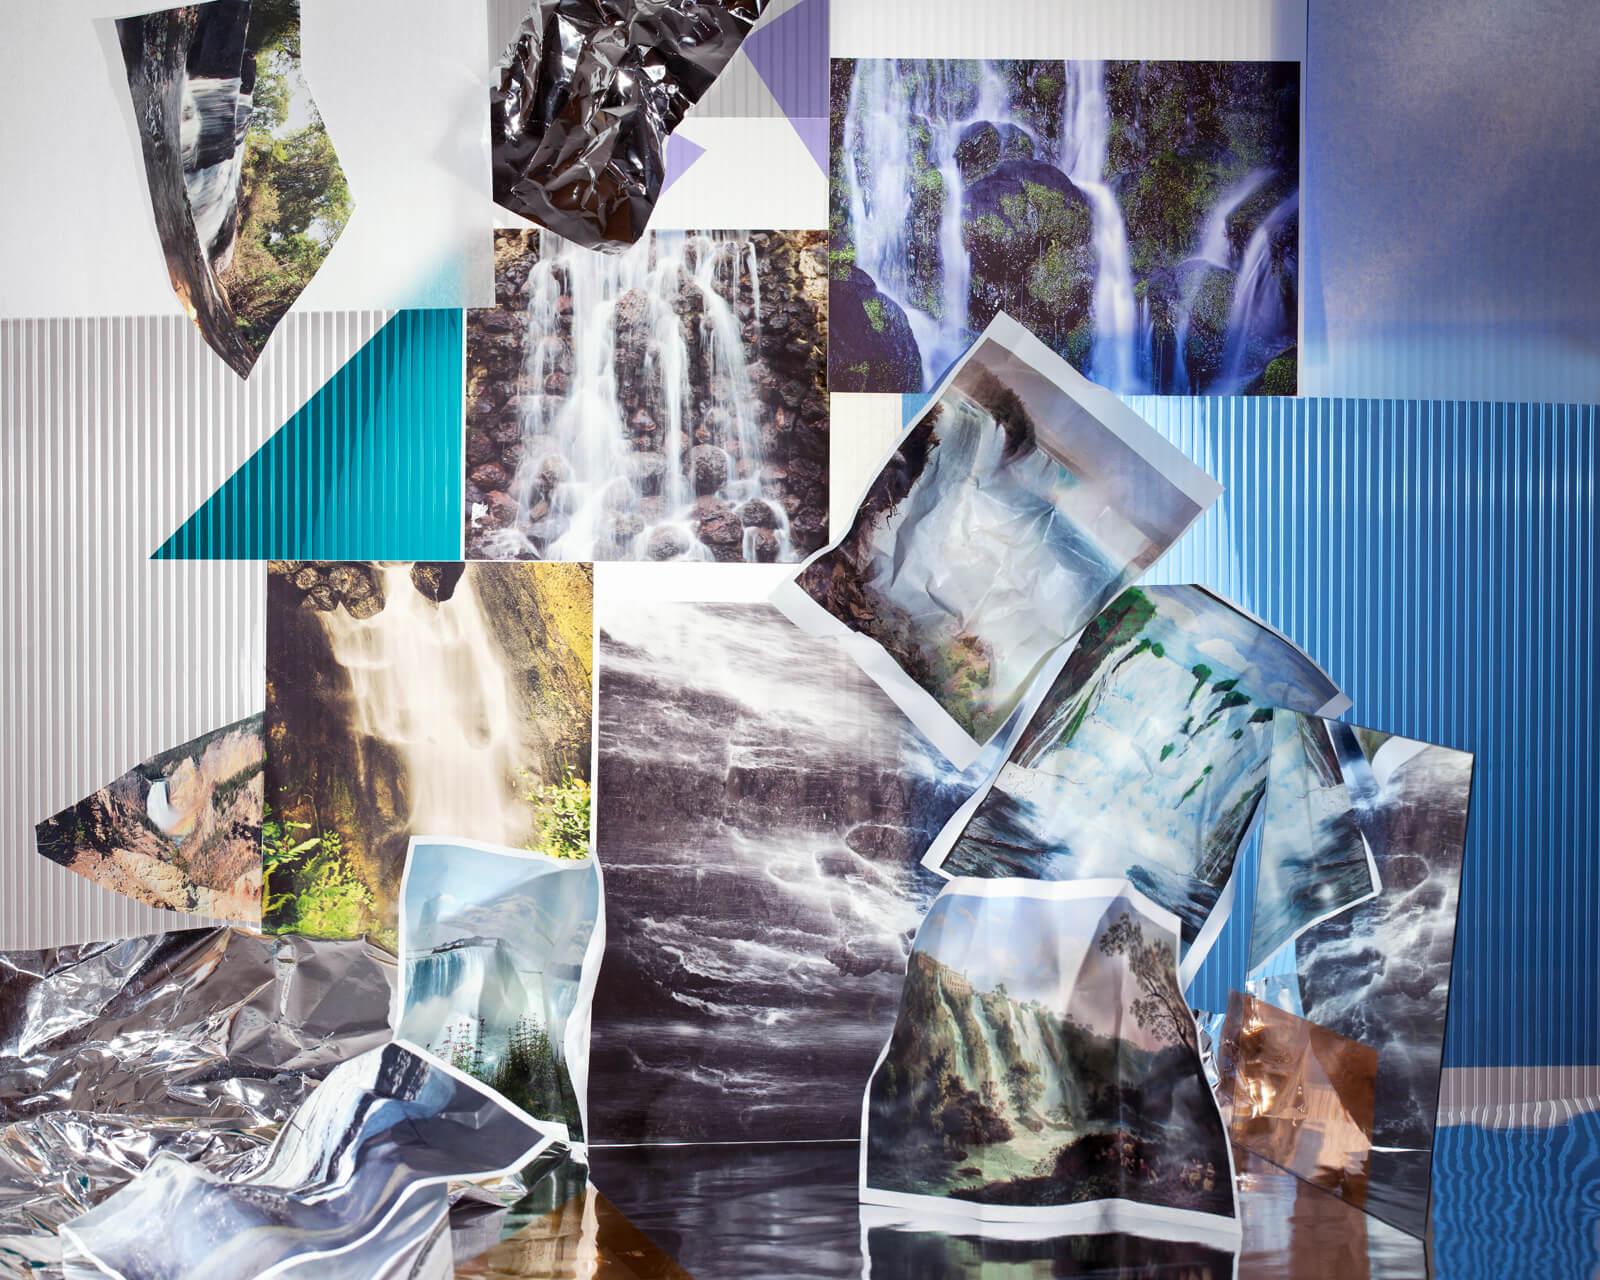 landscape_sublime-Anastasia_samoylova-yogurt_magazine_02